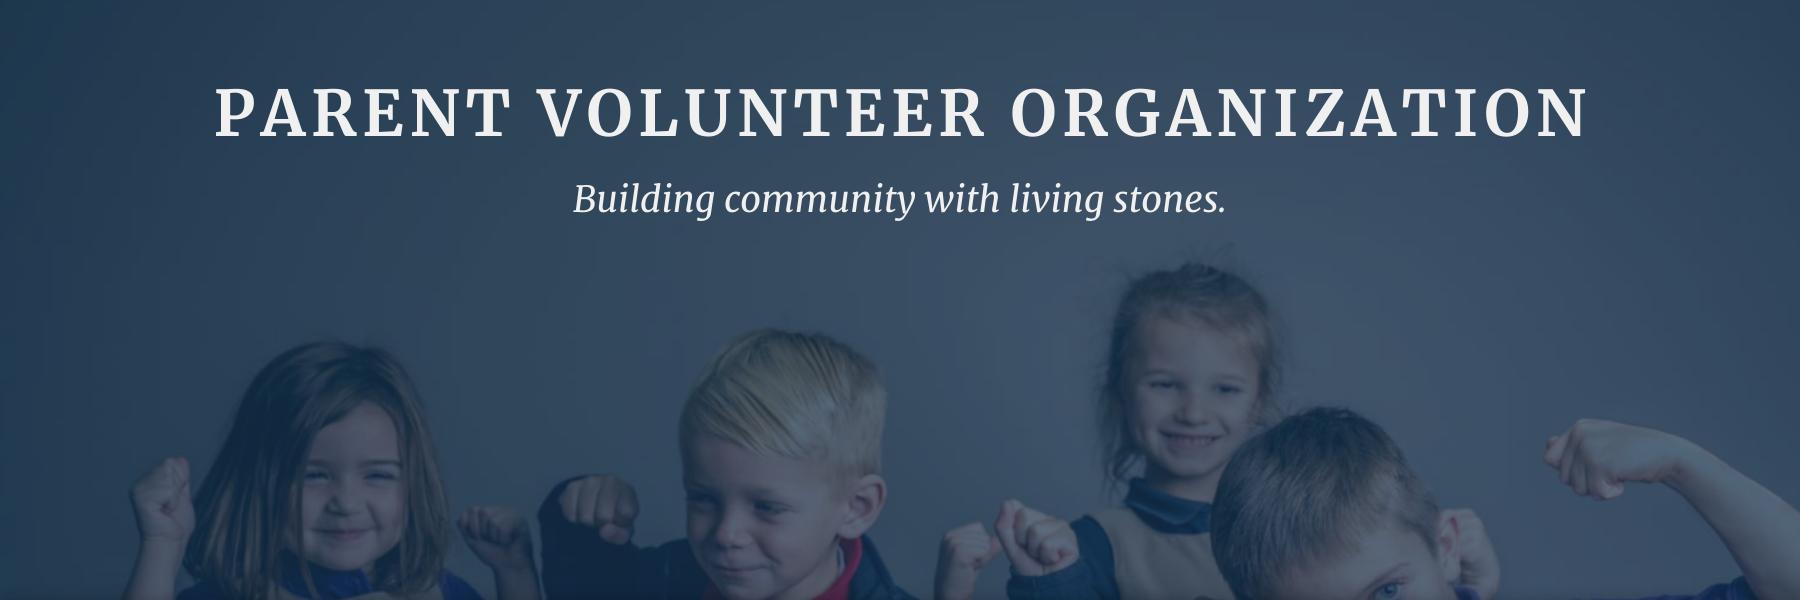 Faith Christian School Parent Volunteer Organization Hero Image